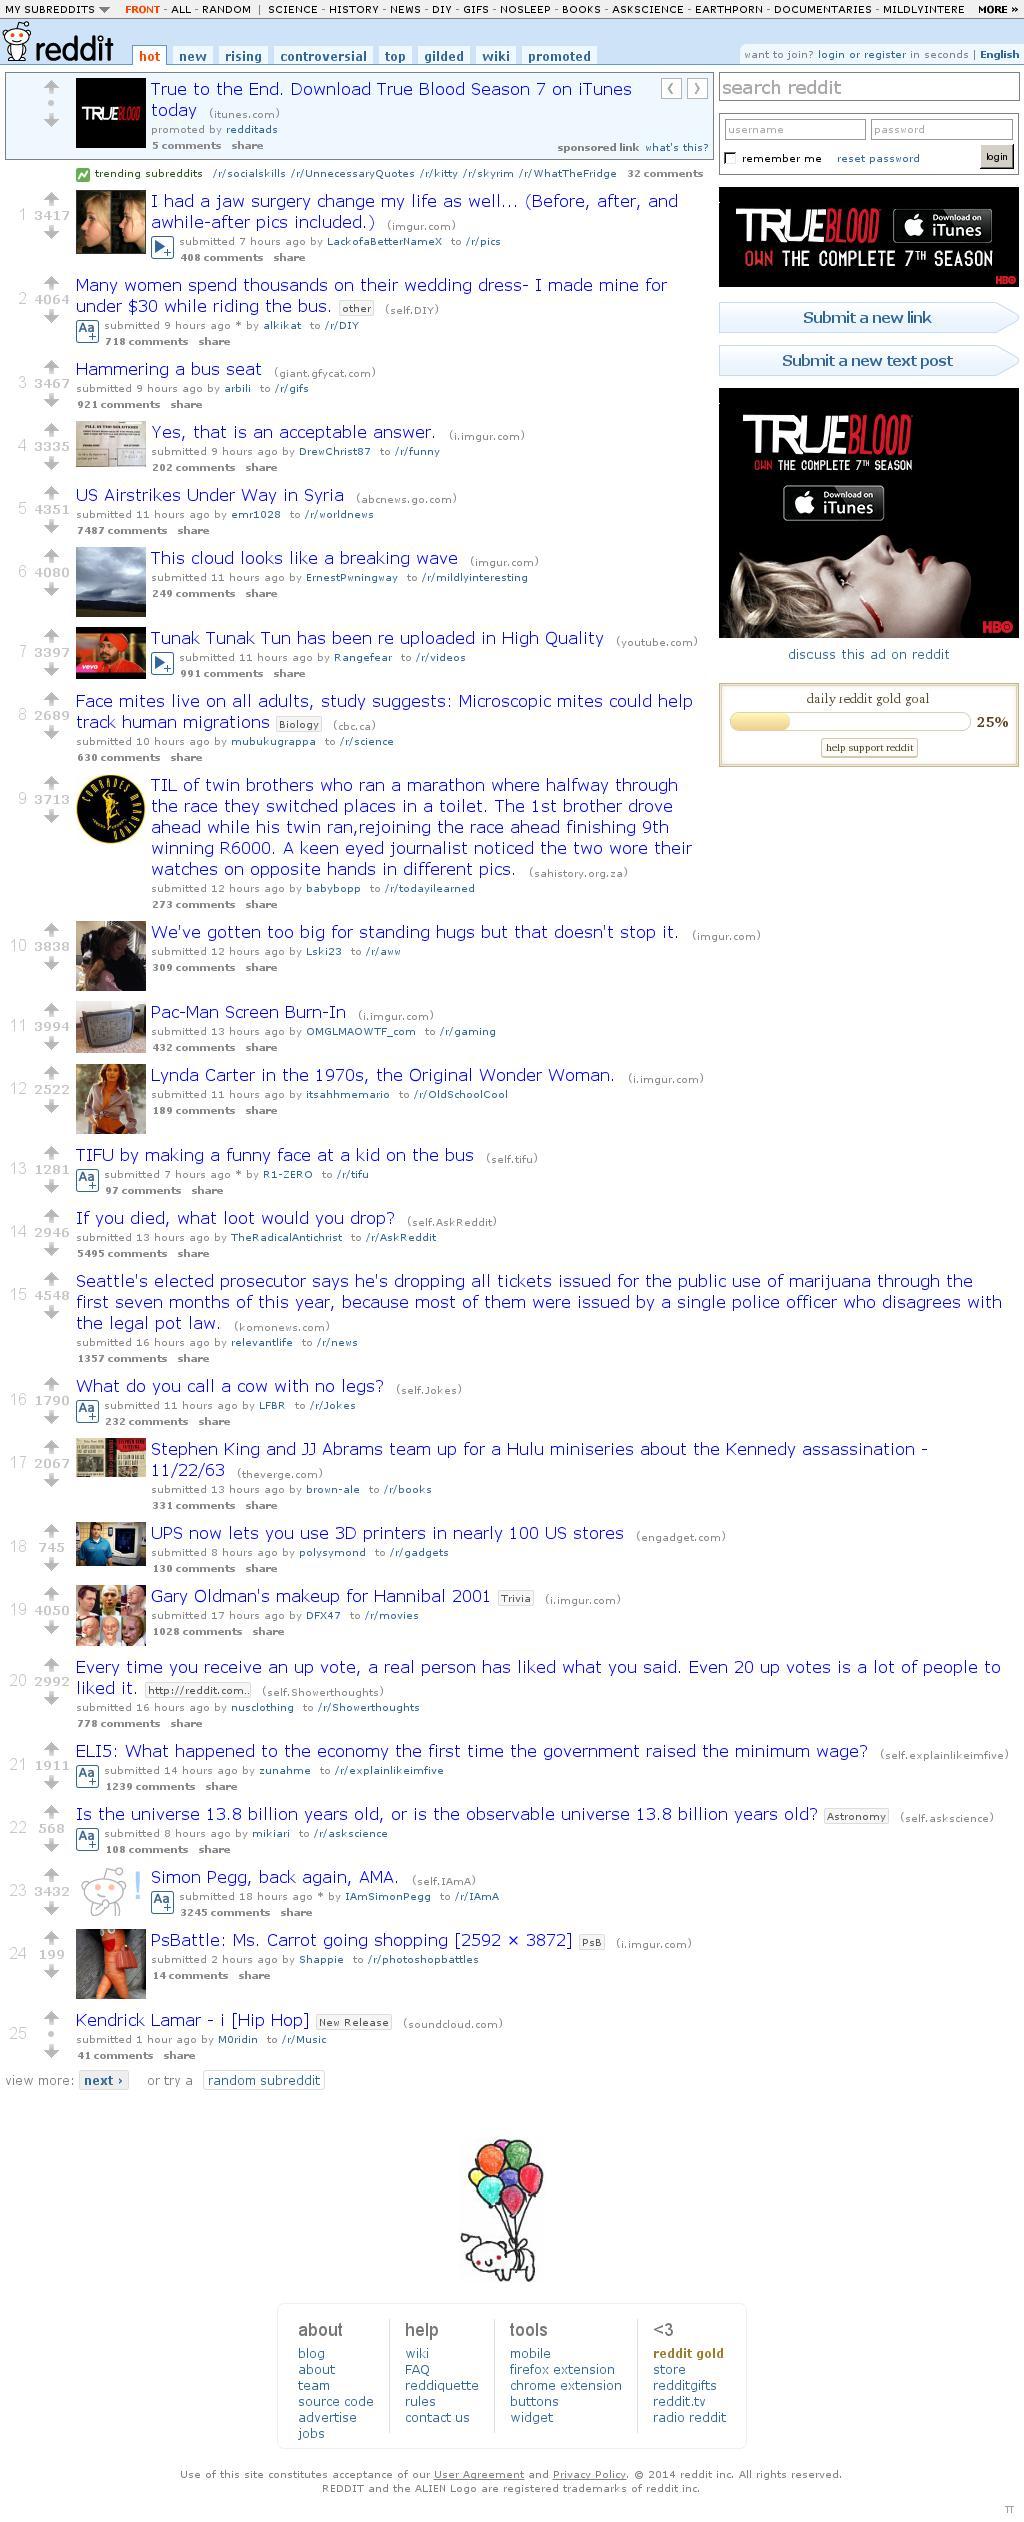 Reddit at Tuesday Sept. 23, 2014, 1:15 p.m. UTC